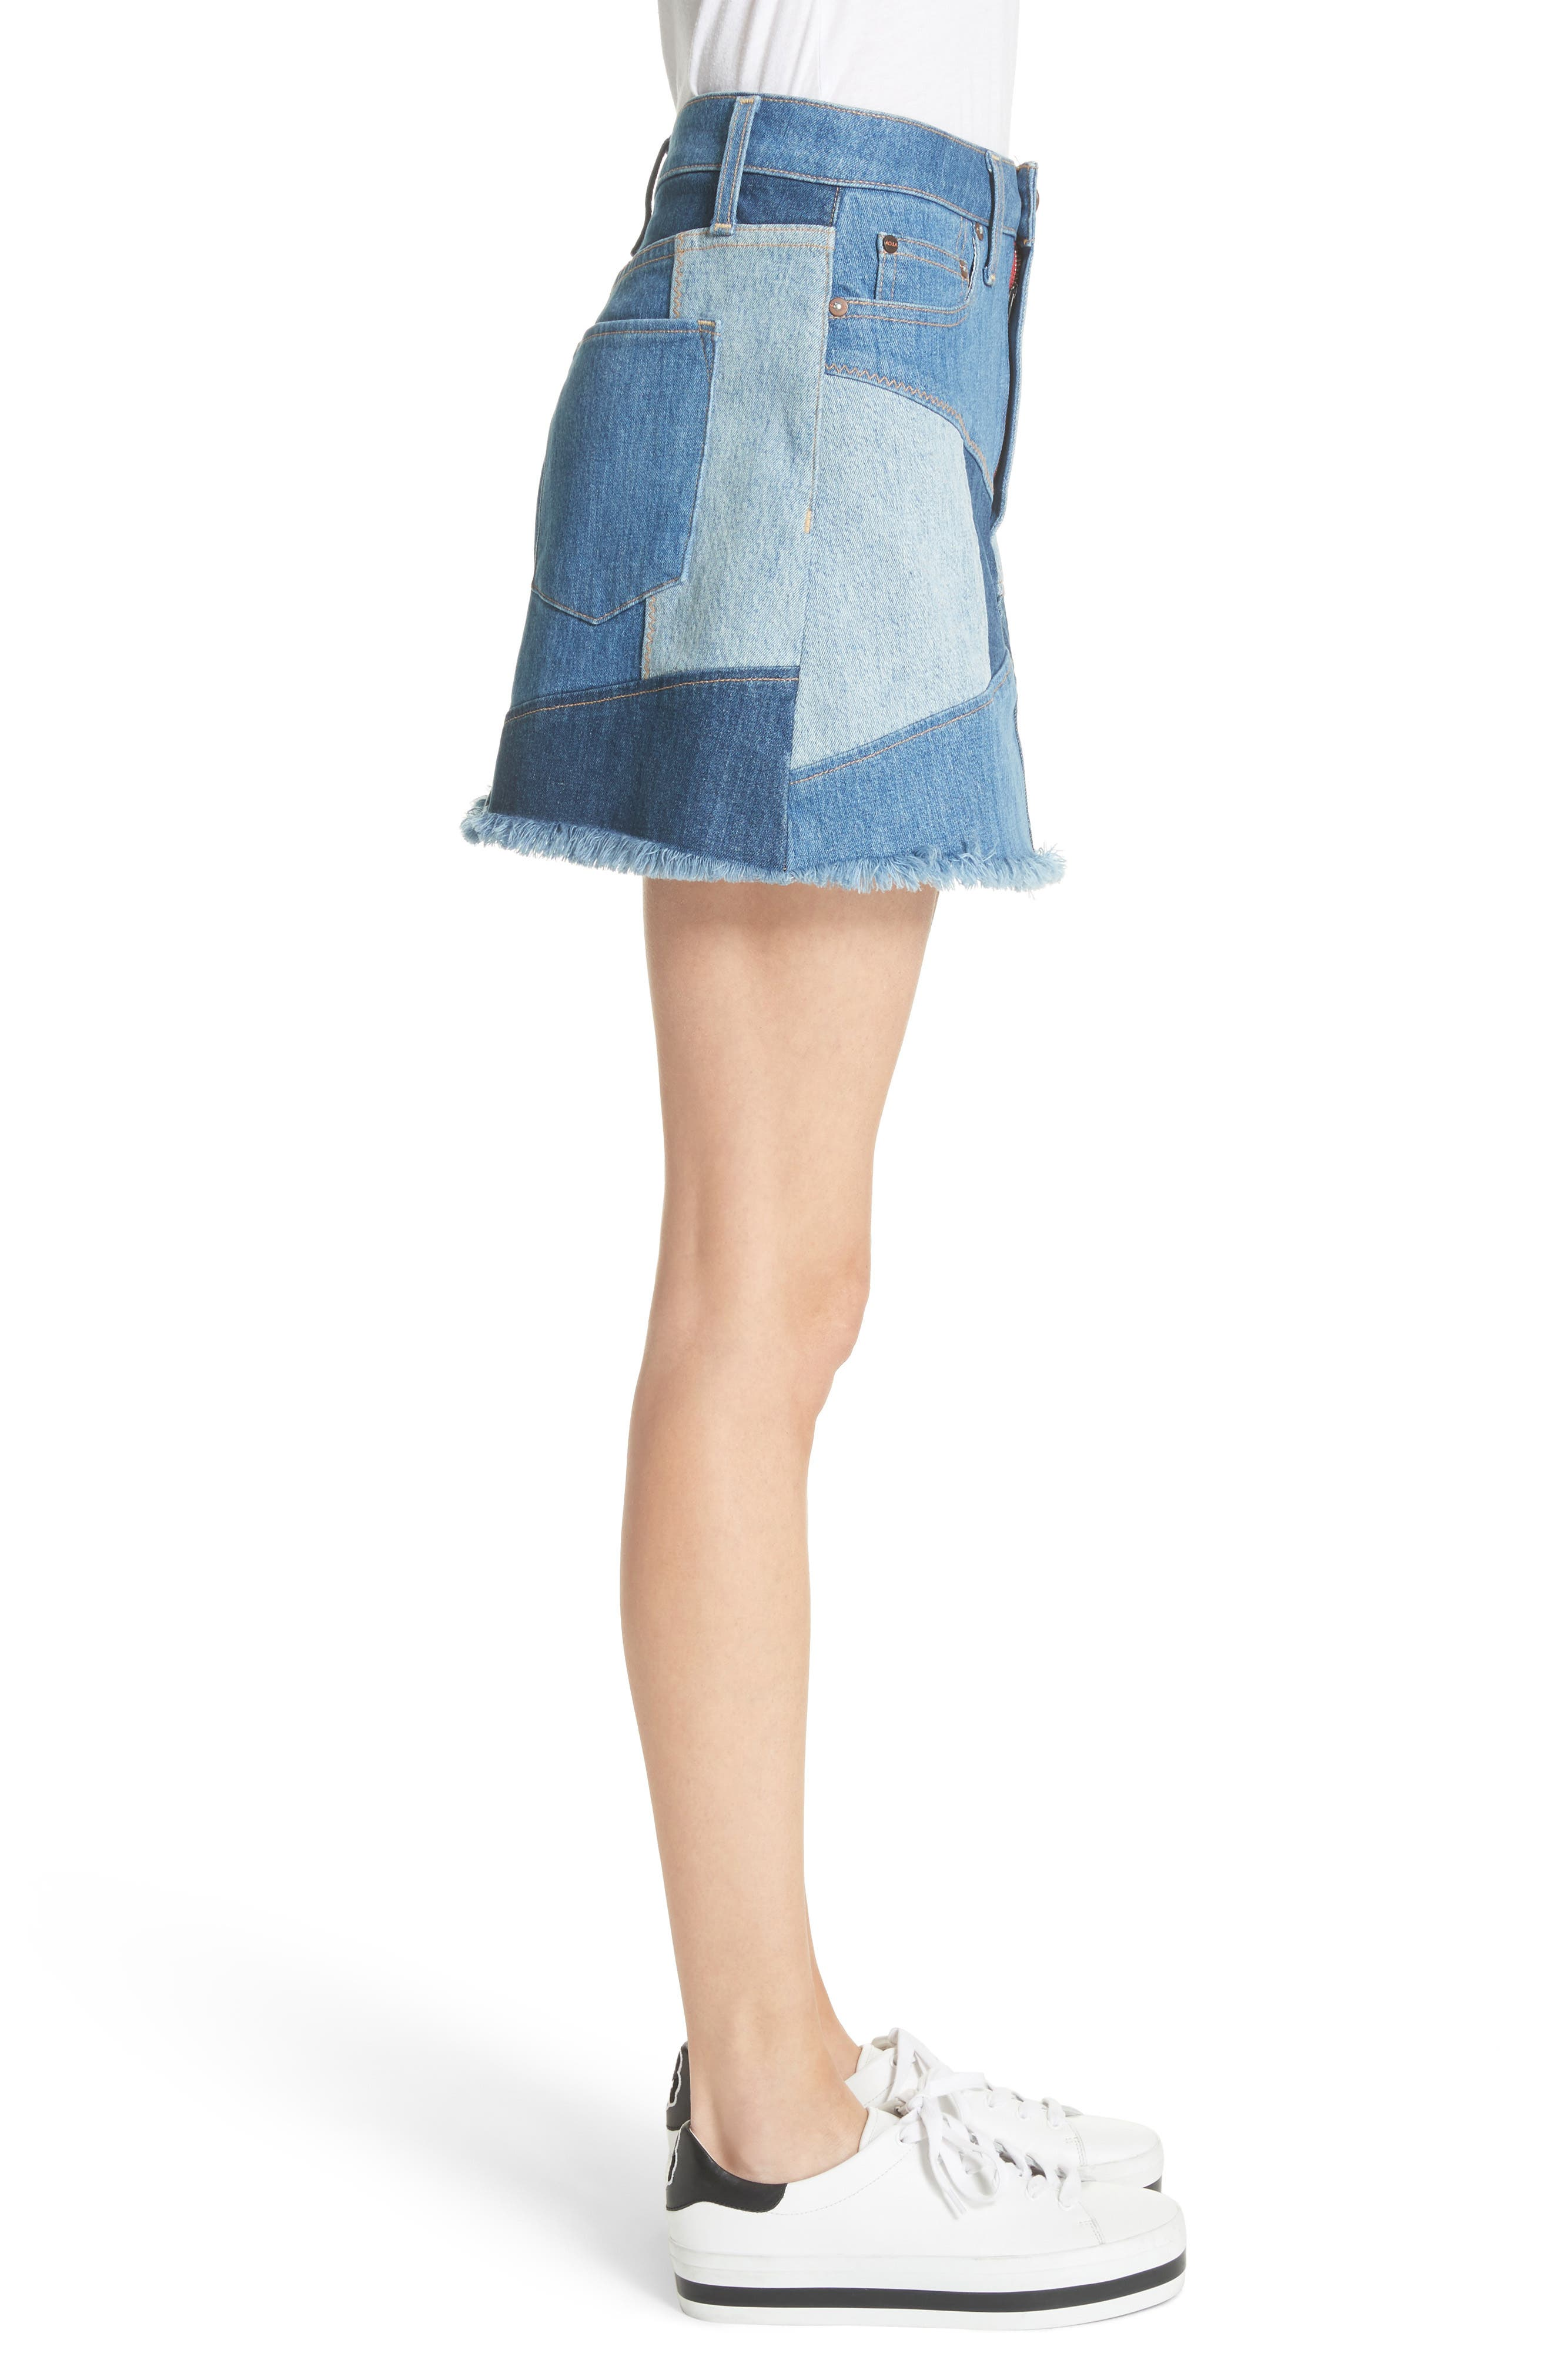 AO.LA Patchwork Denim Miniskirt,                             Alternate thumbnail 3, color,                             485